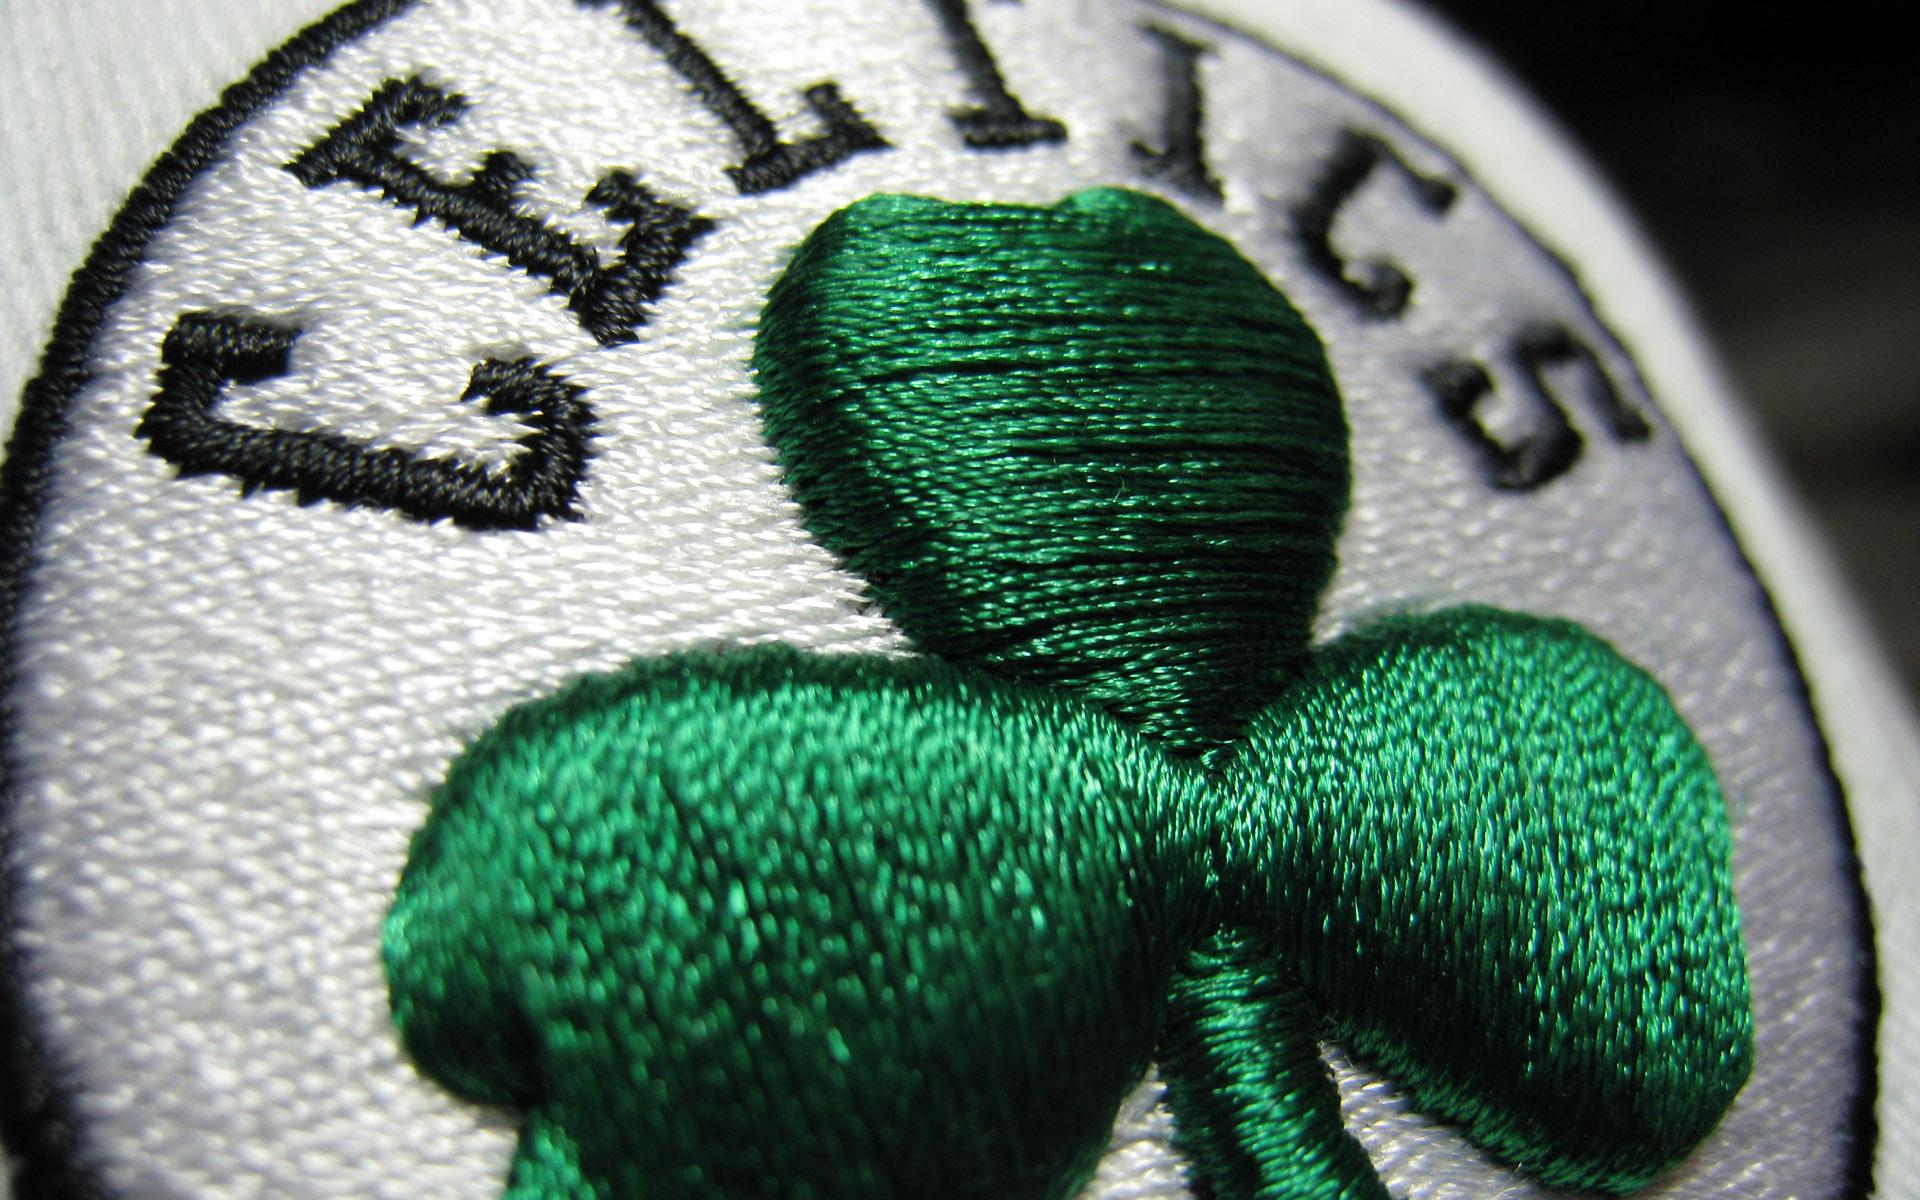 Boston Celtics Logo Embroidery Photo Gallery HD Wallpapers Desktop 1920x1200